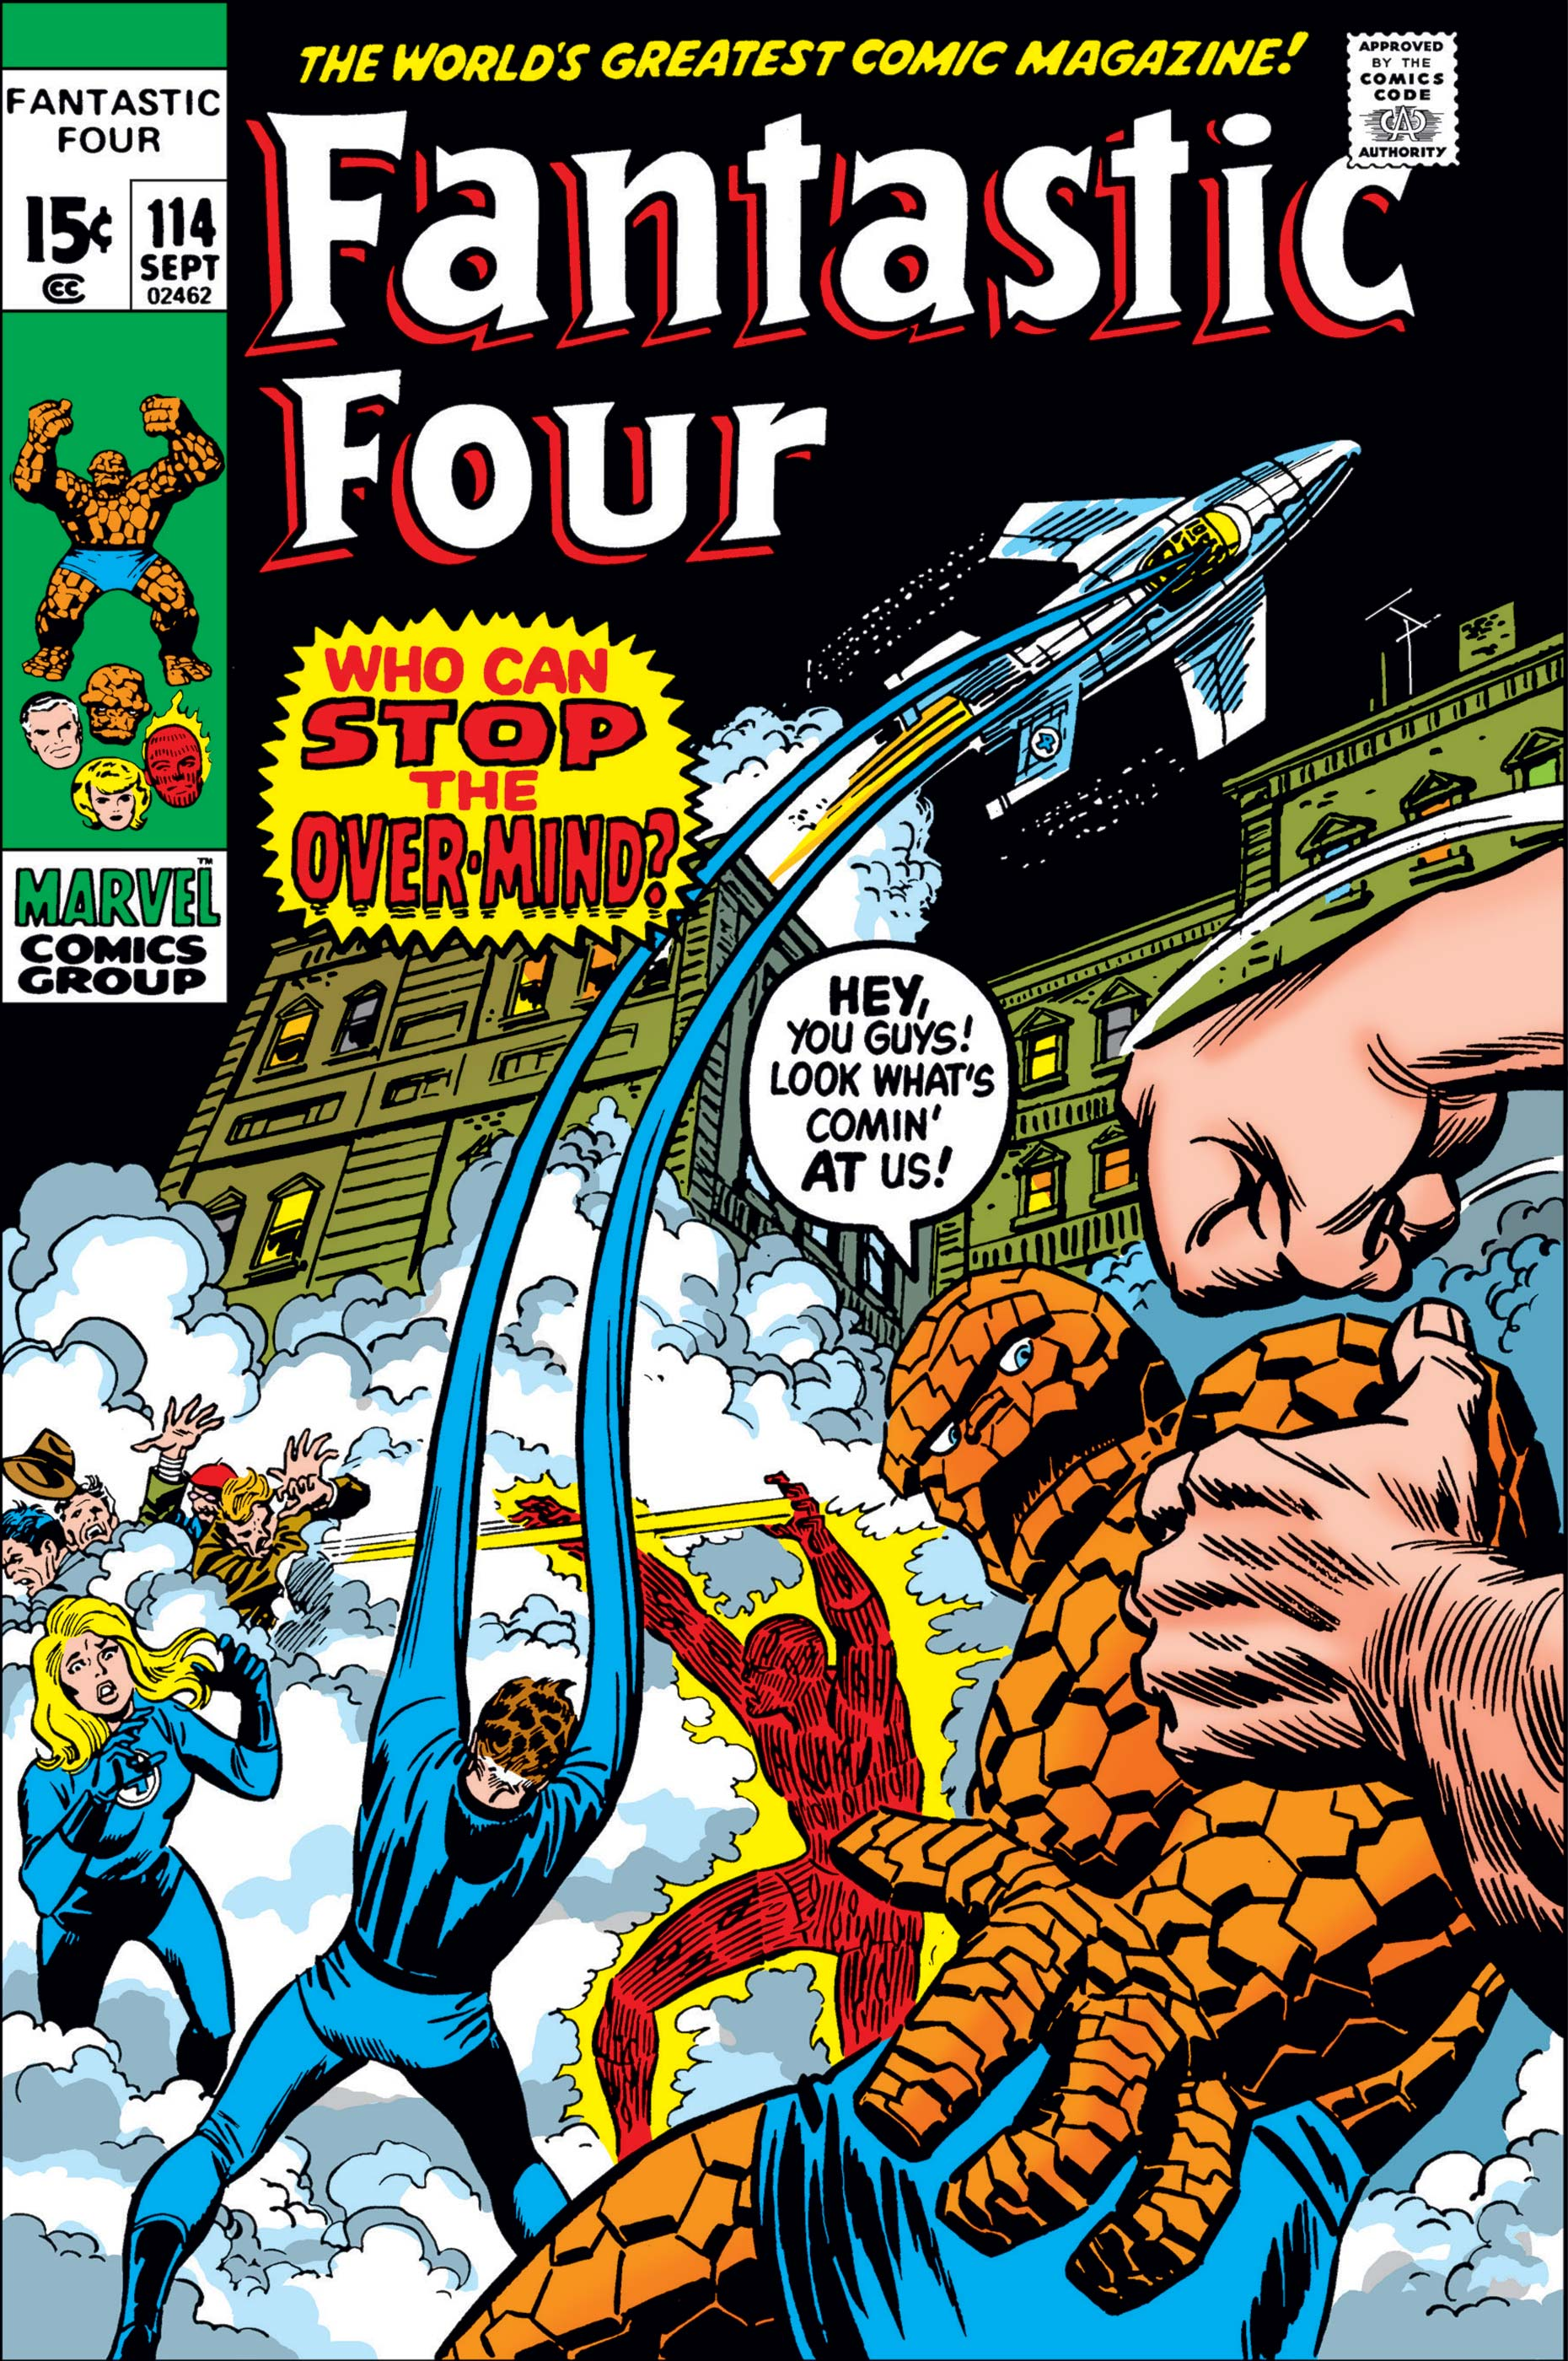 Fantastic Four (1961) #114